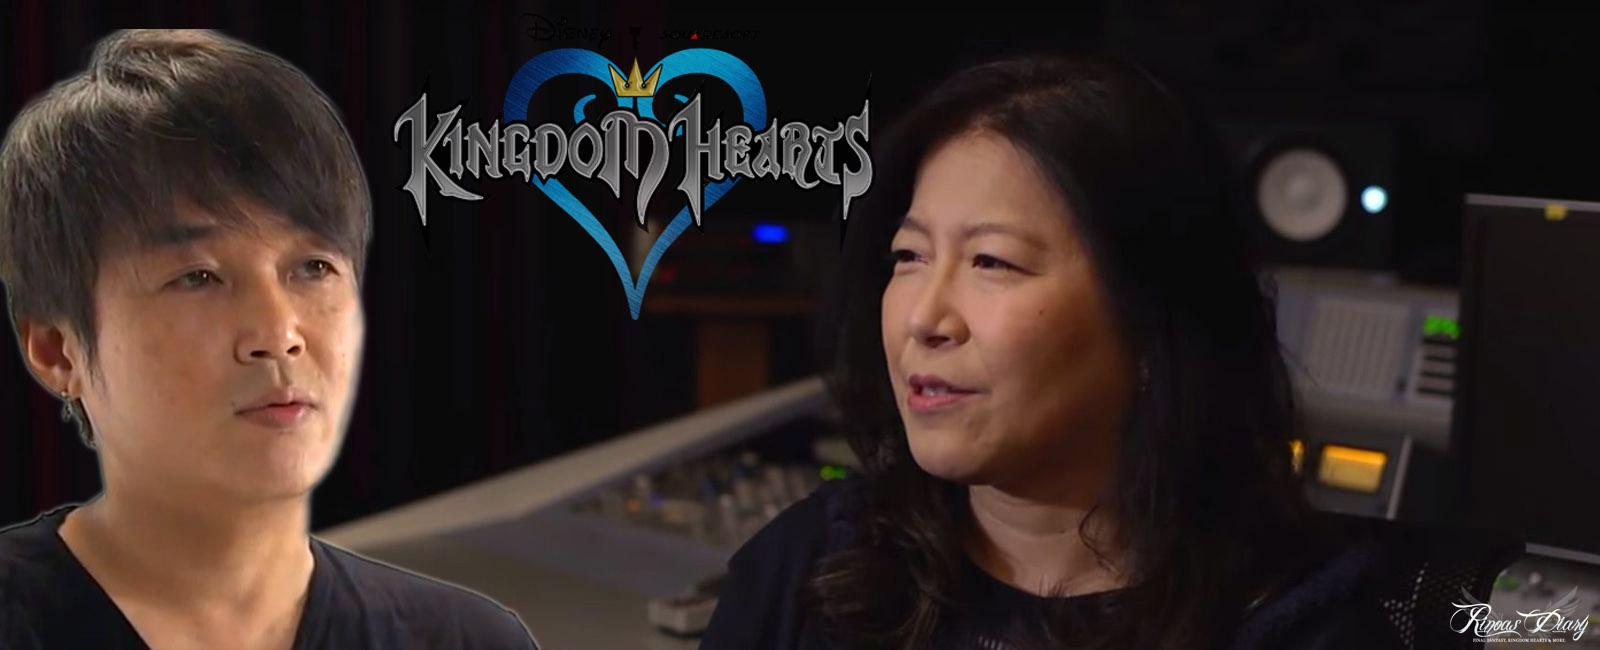 Intervista a Tetsuya Nomura e Yoko Shimomura sulle musiche di Kingdom Hearts